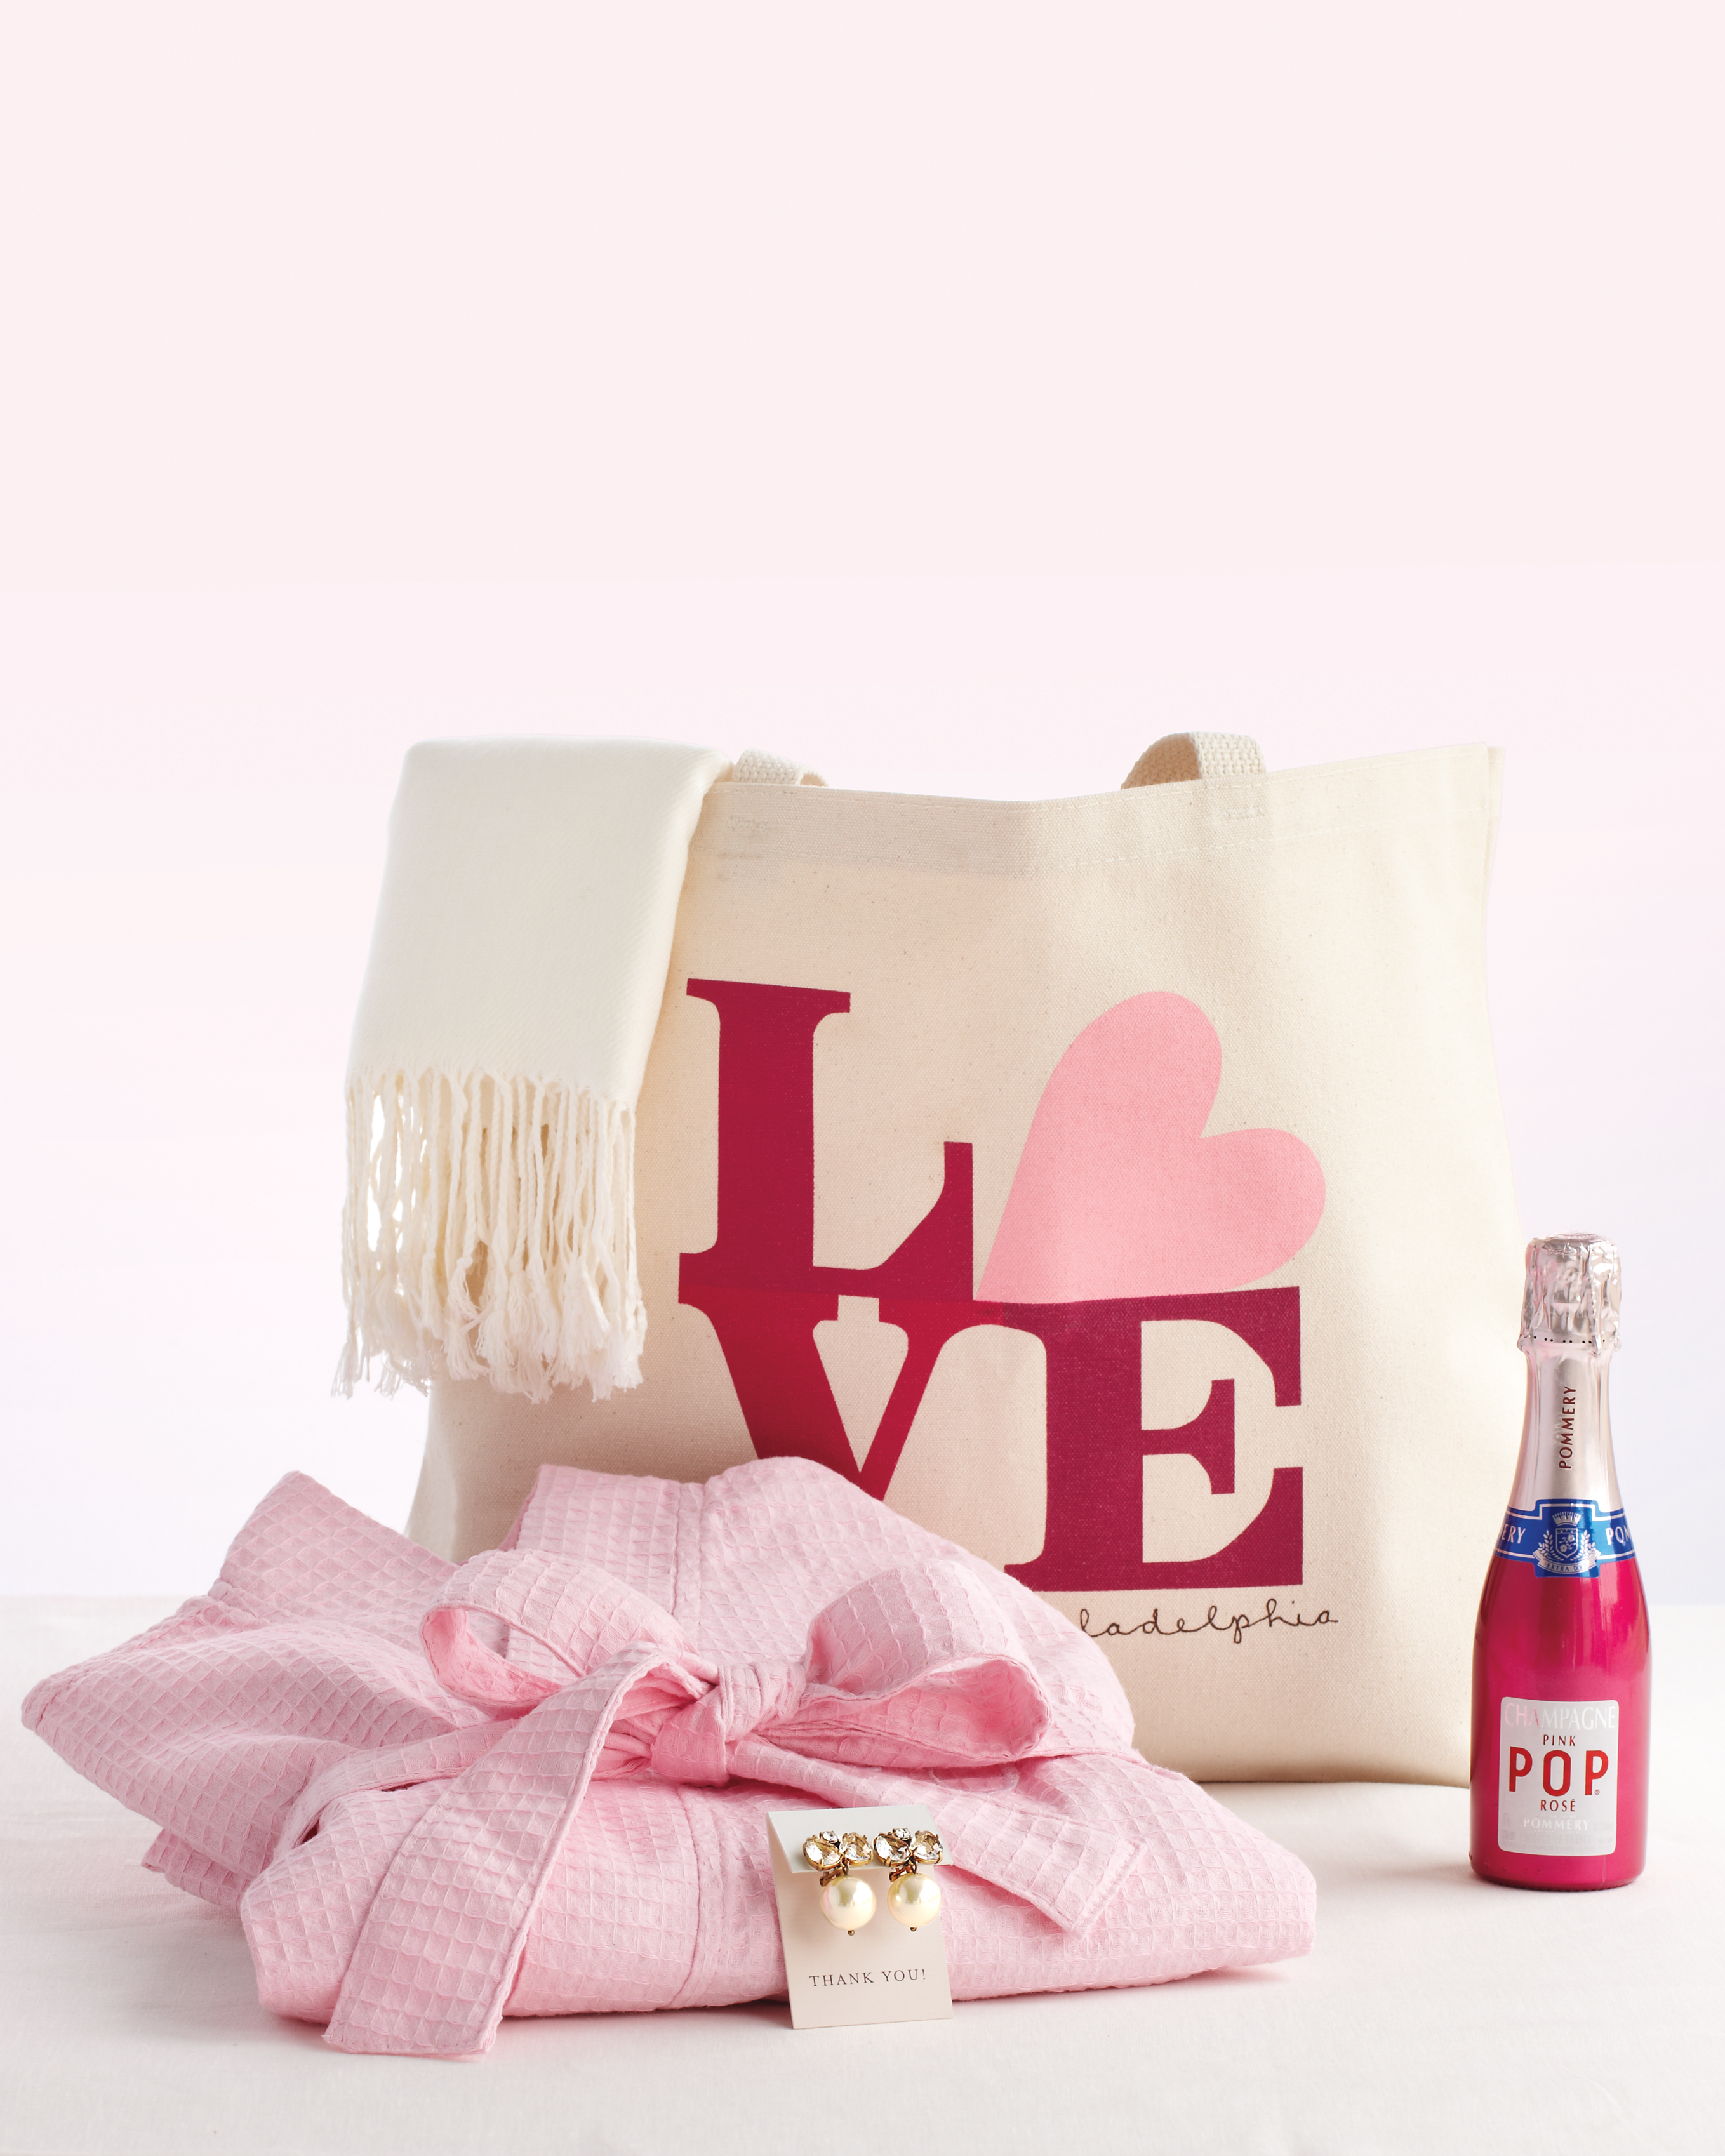 katie-james-bridesmaid-bag-128-1-mwd108944.jpg